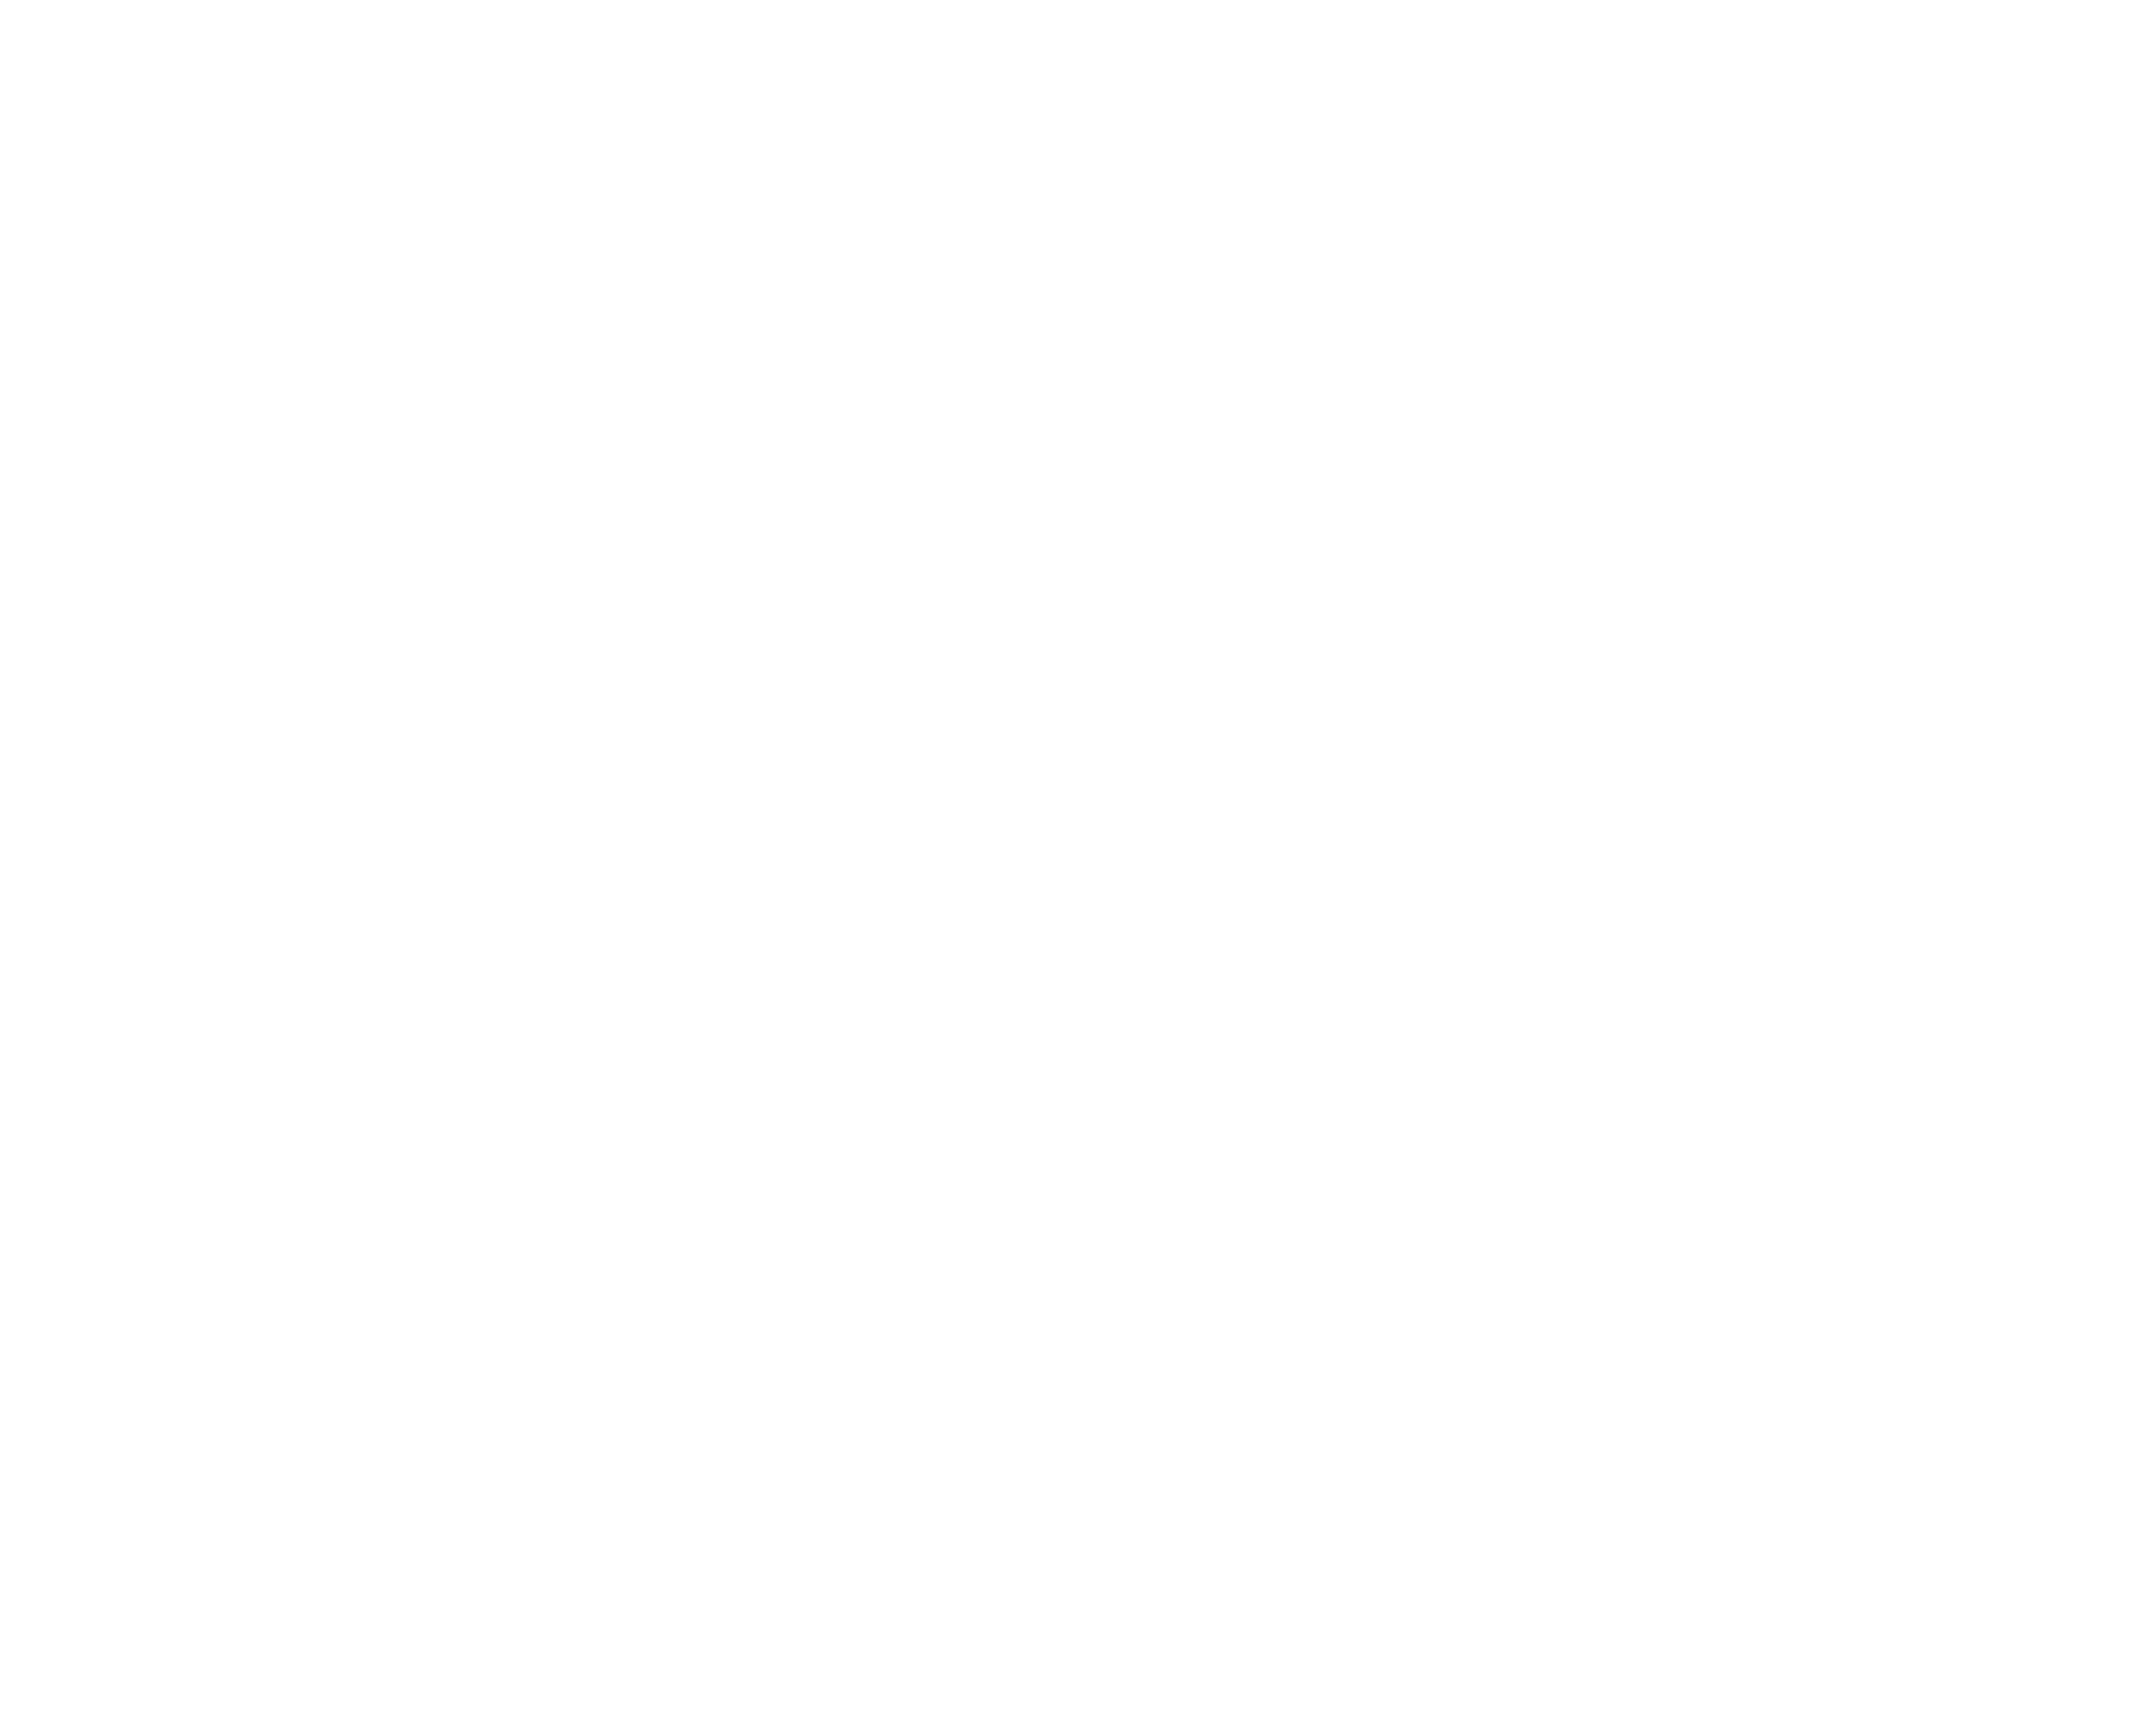 GeneticSupportFoundation-HumanKaryotype-White